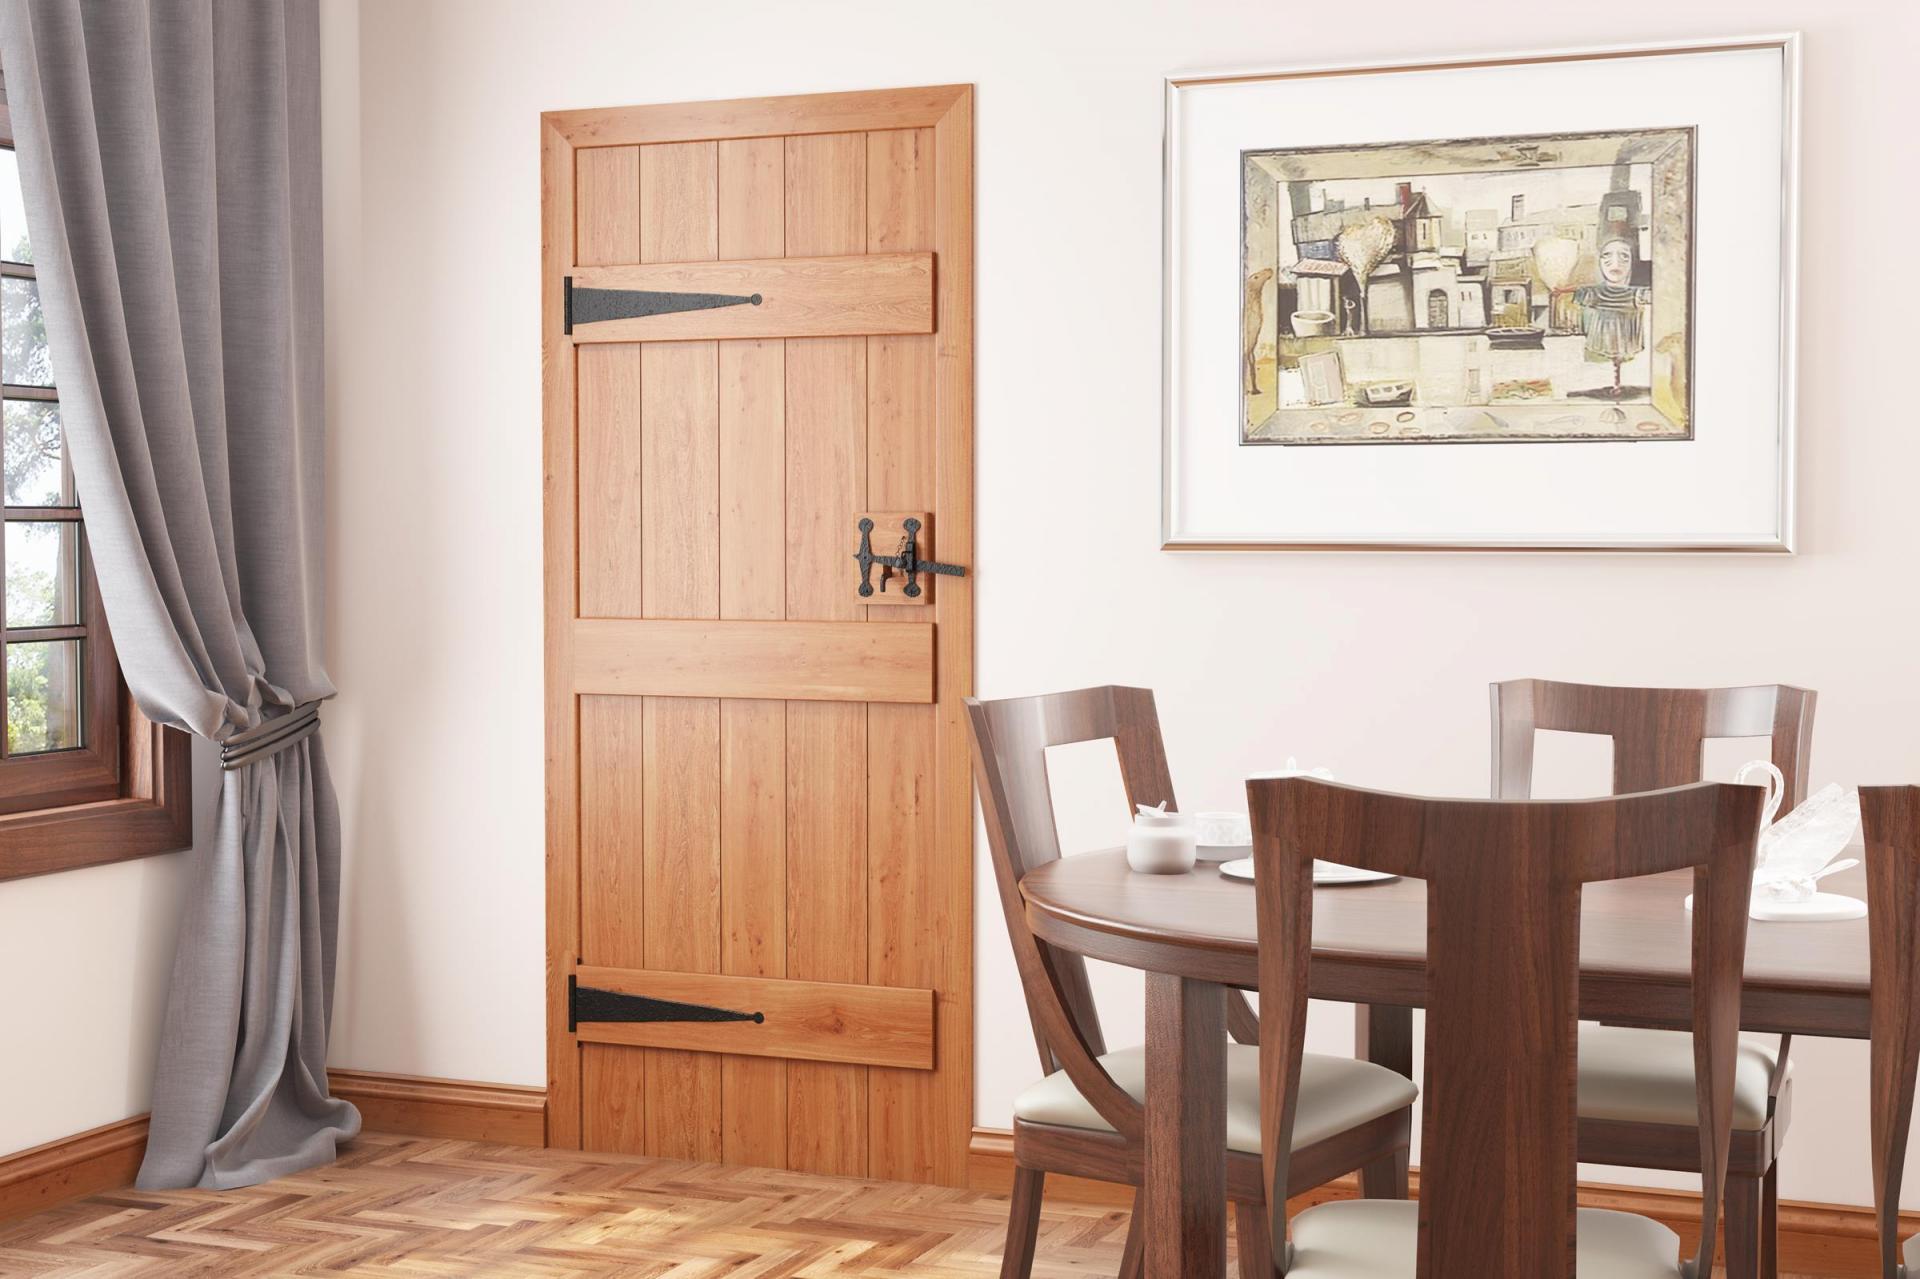 Solid Oak Ledged Doors u0026 Floors & Solid Oak Ledged Doors | Blueprint Joinery